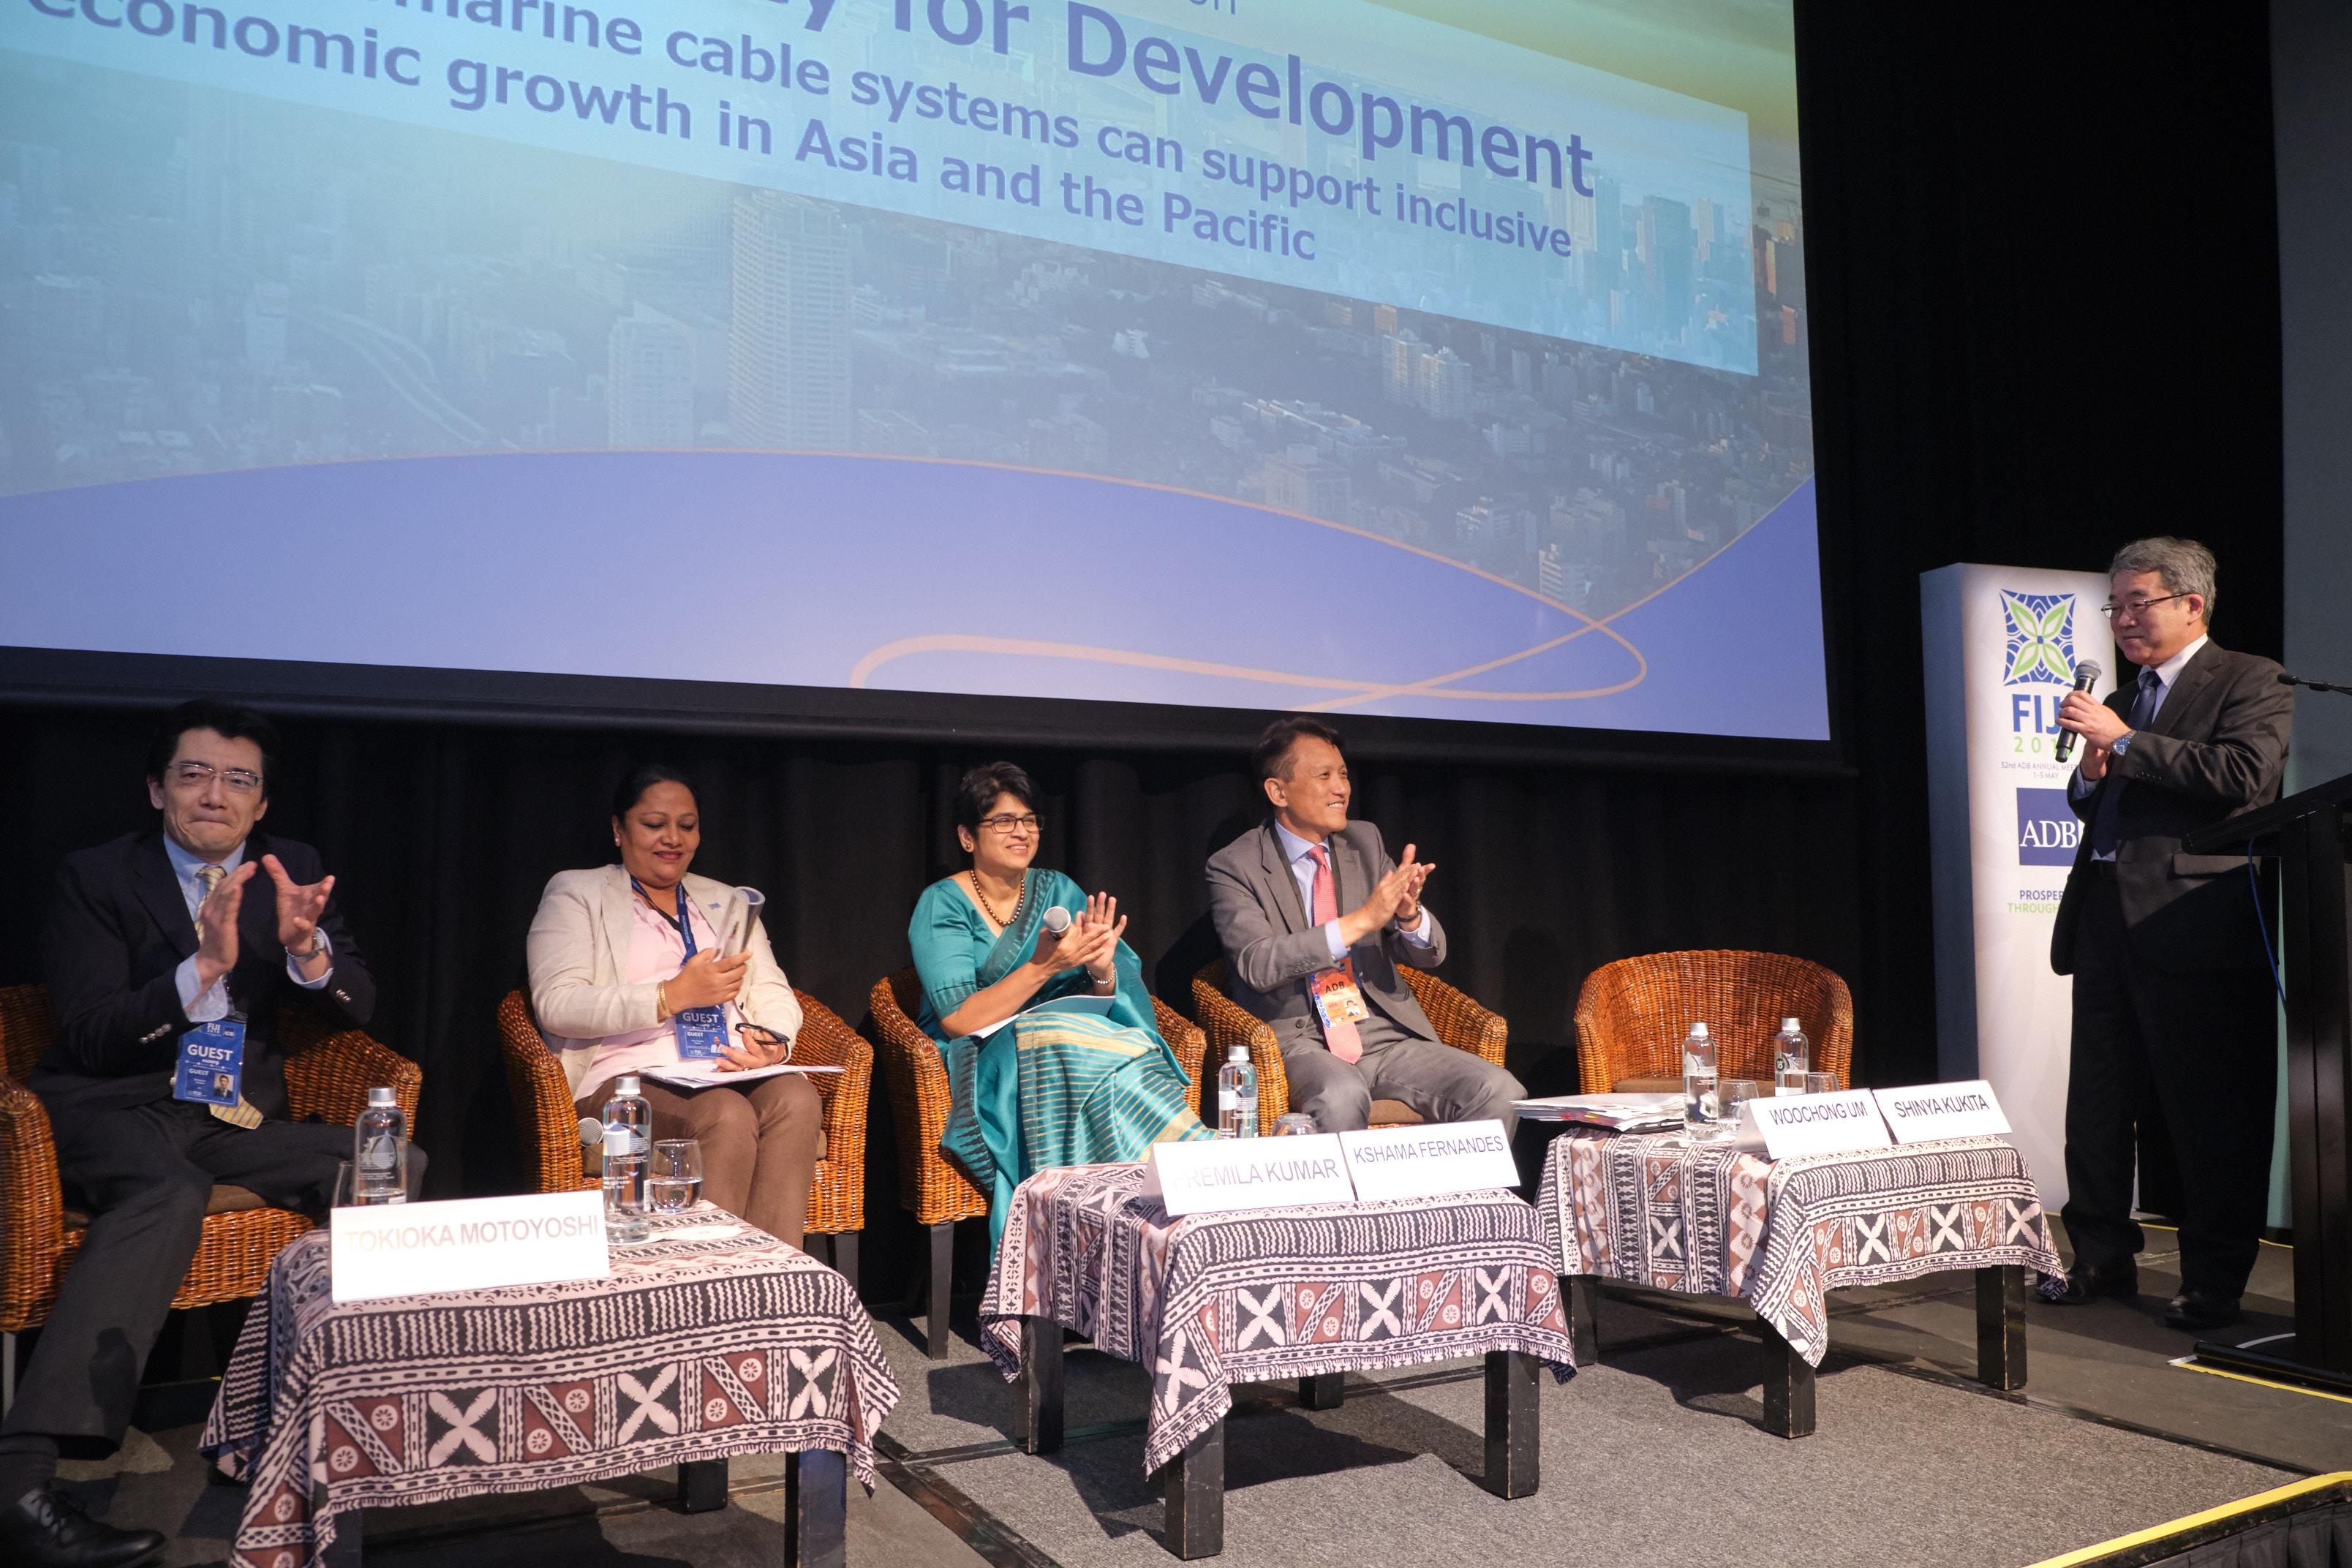 Connectivity for Development